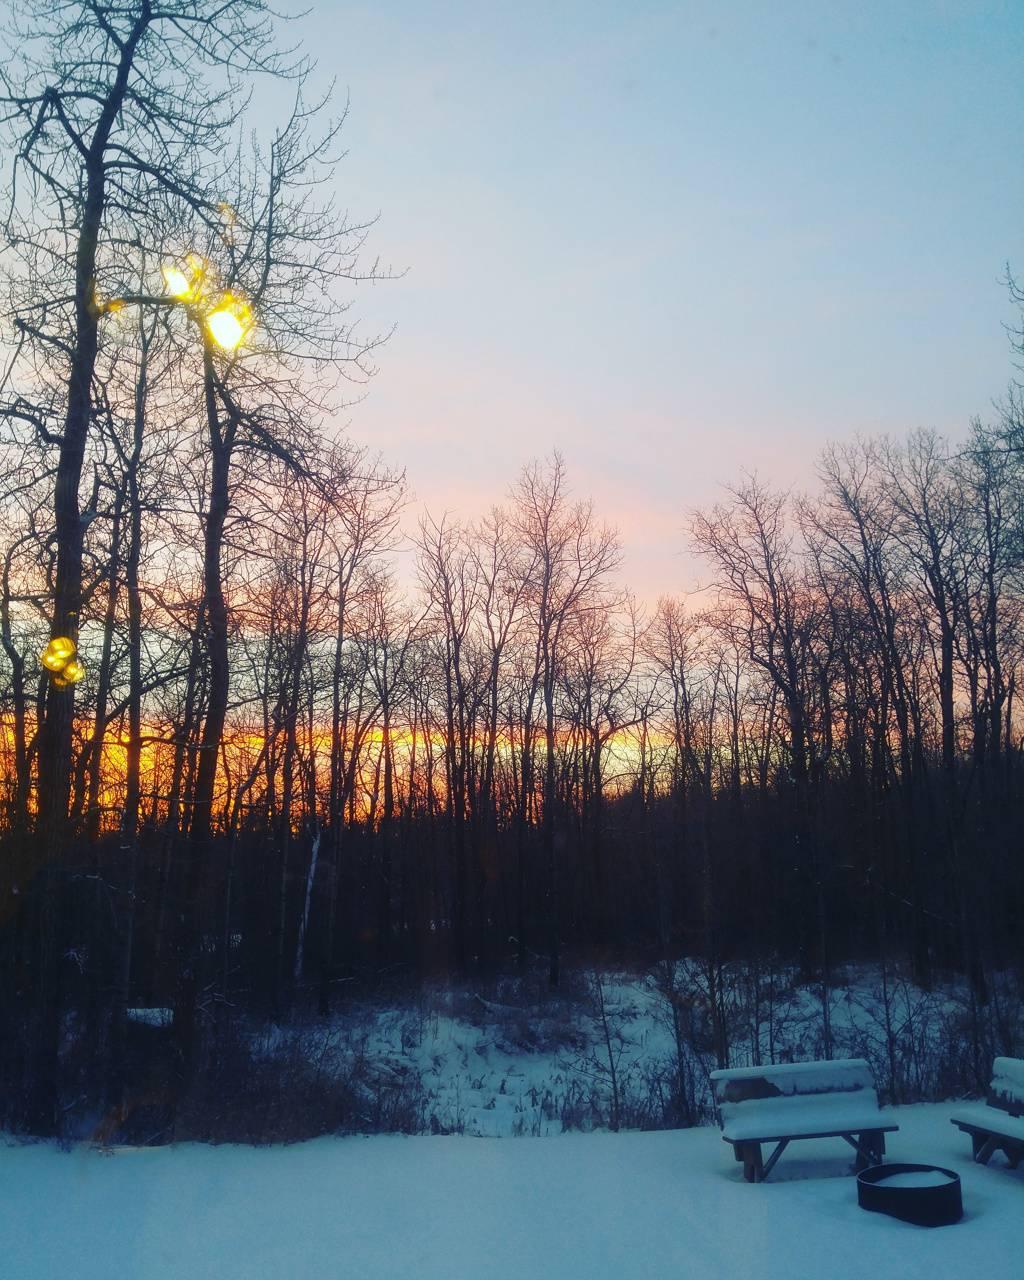 Quiet Winter Evening